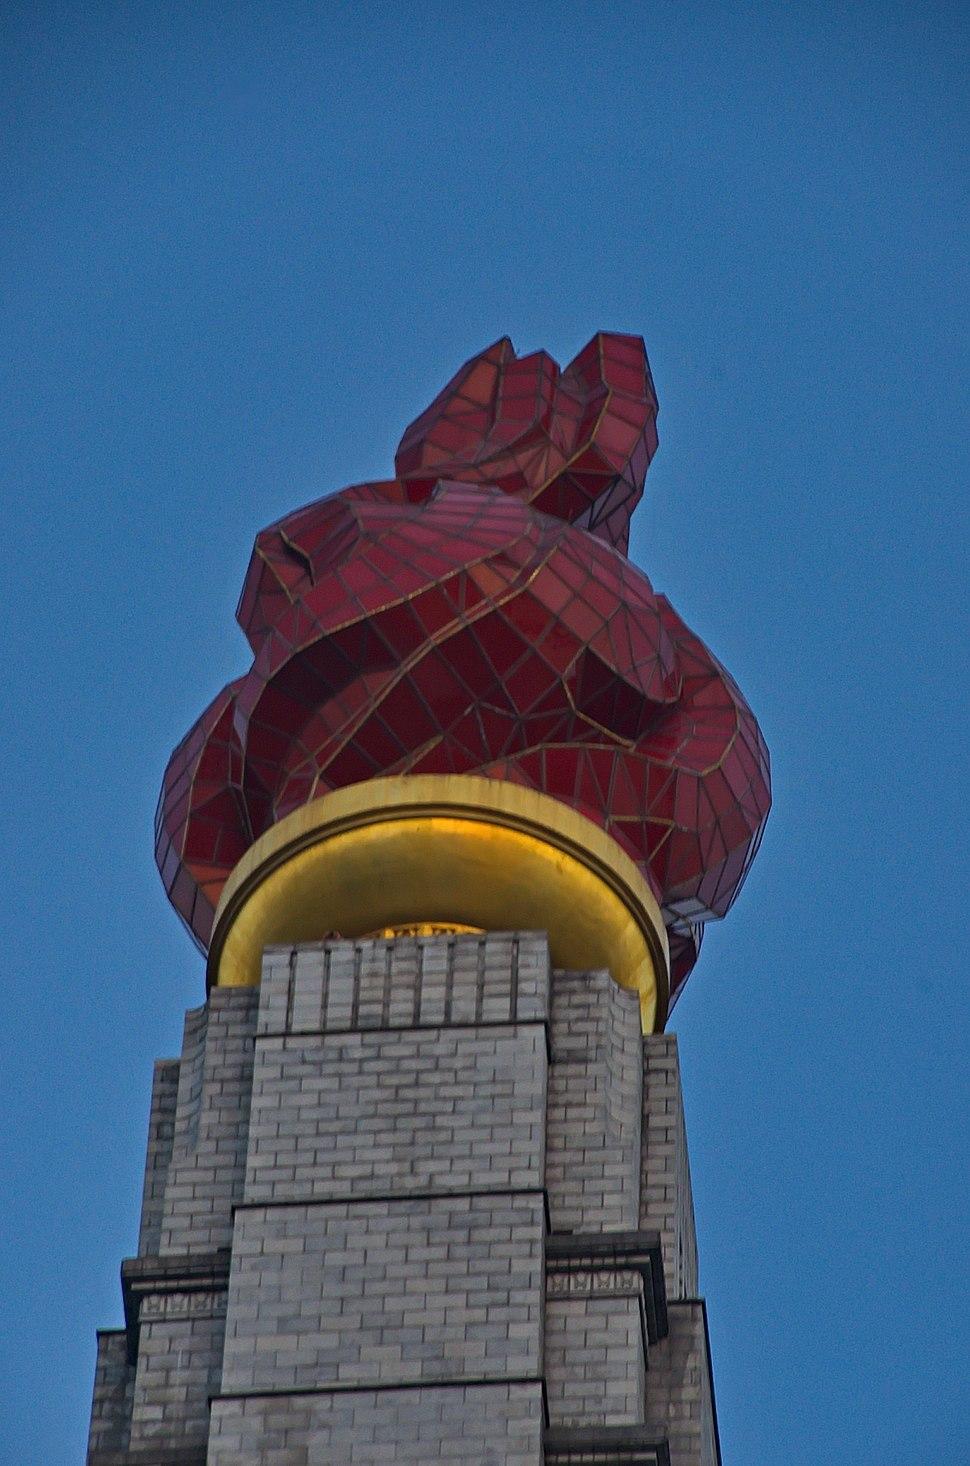 1730 - Nordkorea 2015 - Pjöngjang - Juche Turm (22791978320)